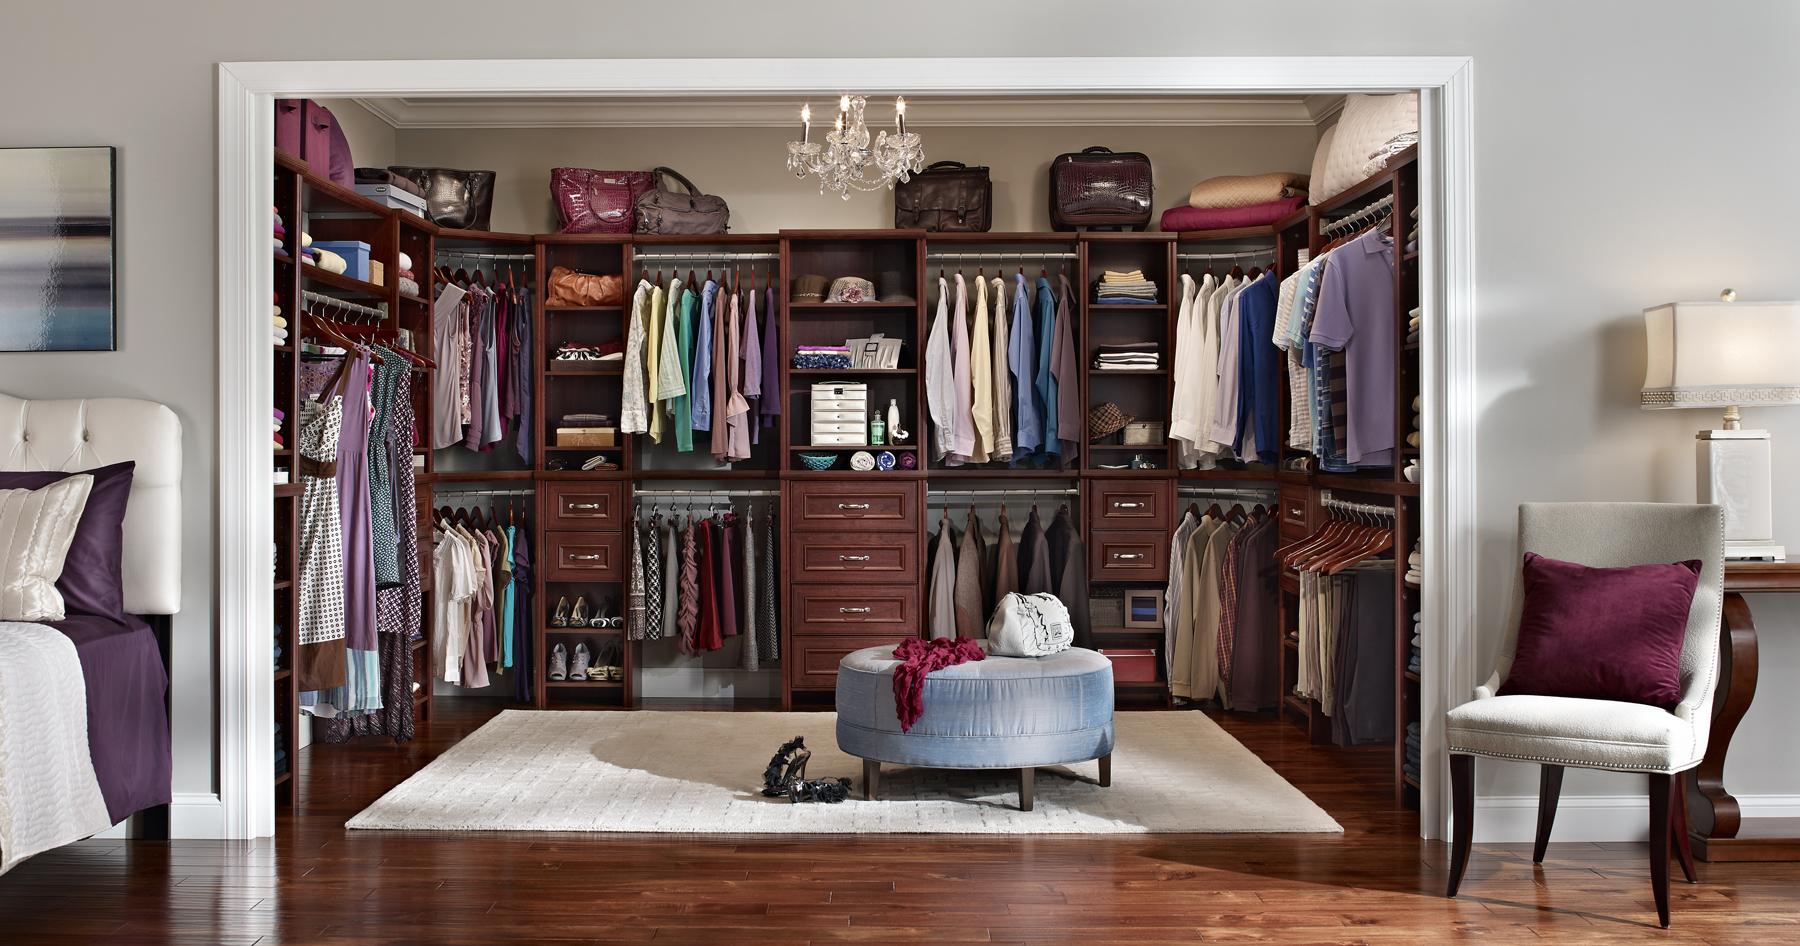 Bedroom closet storage. Bedroom closet doors sliding   large and beautiful photos  Photo